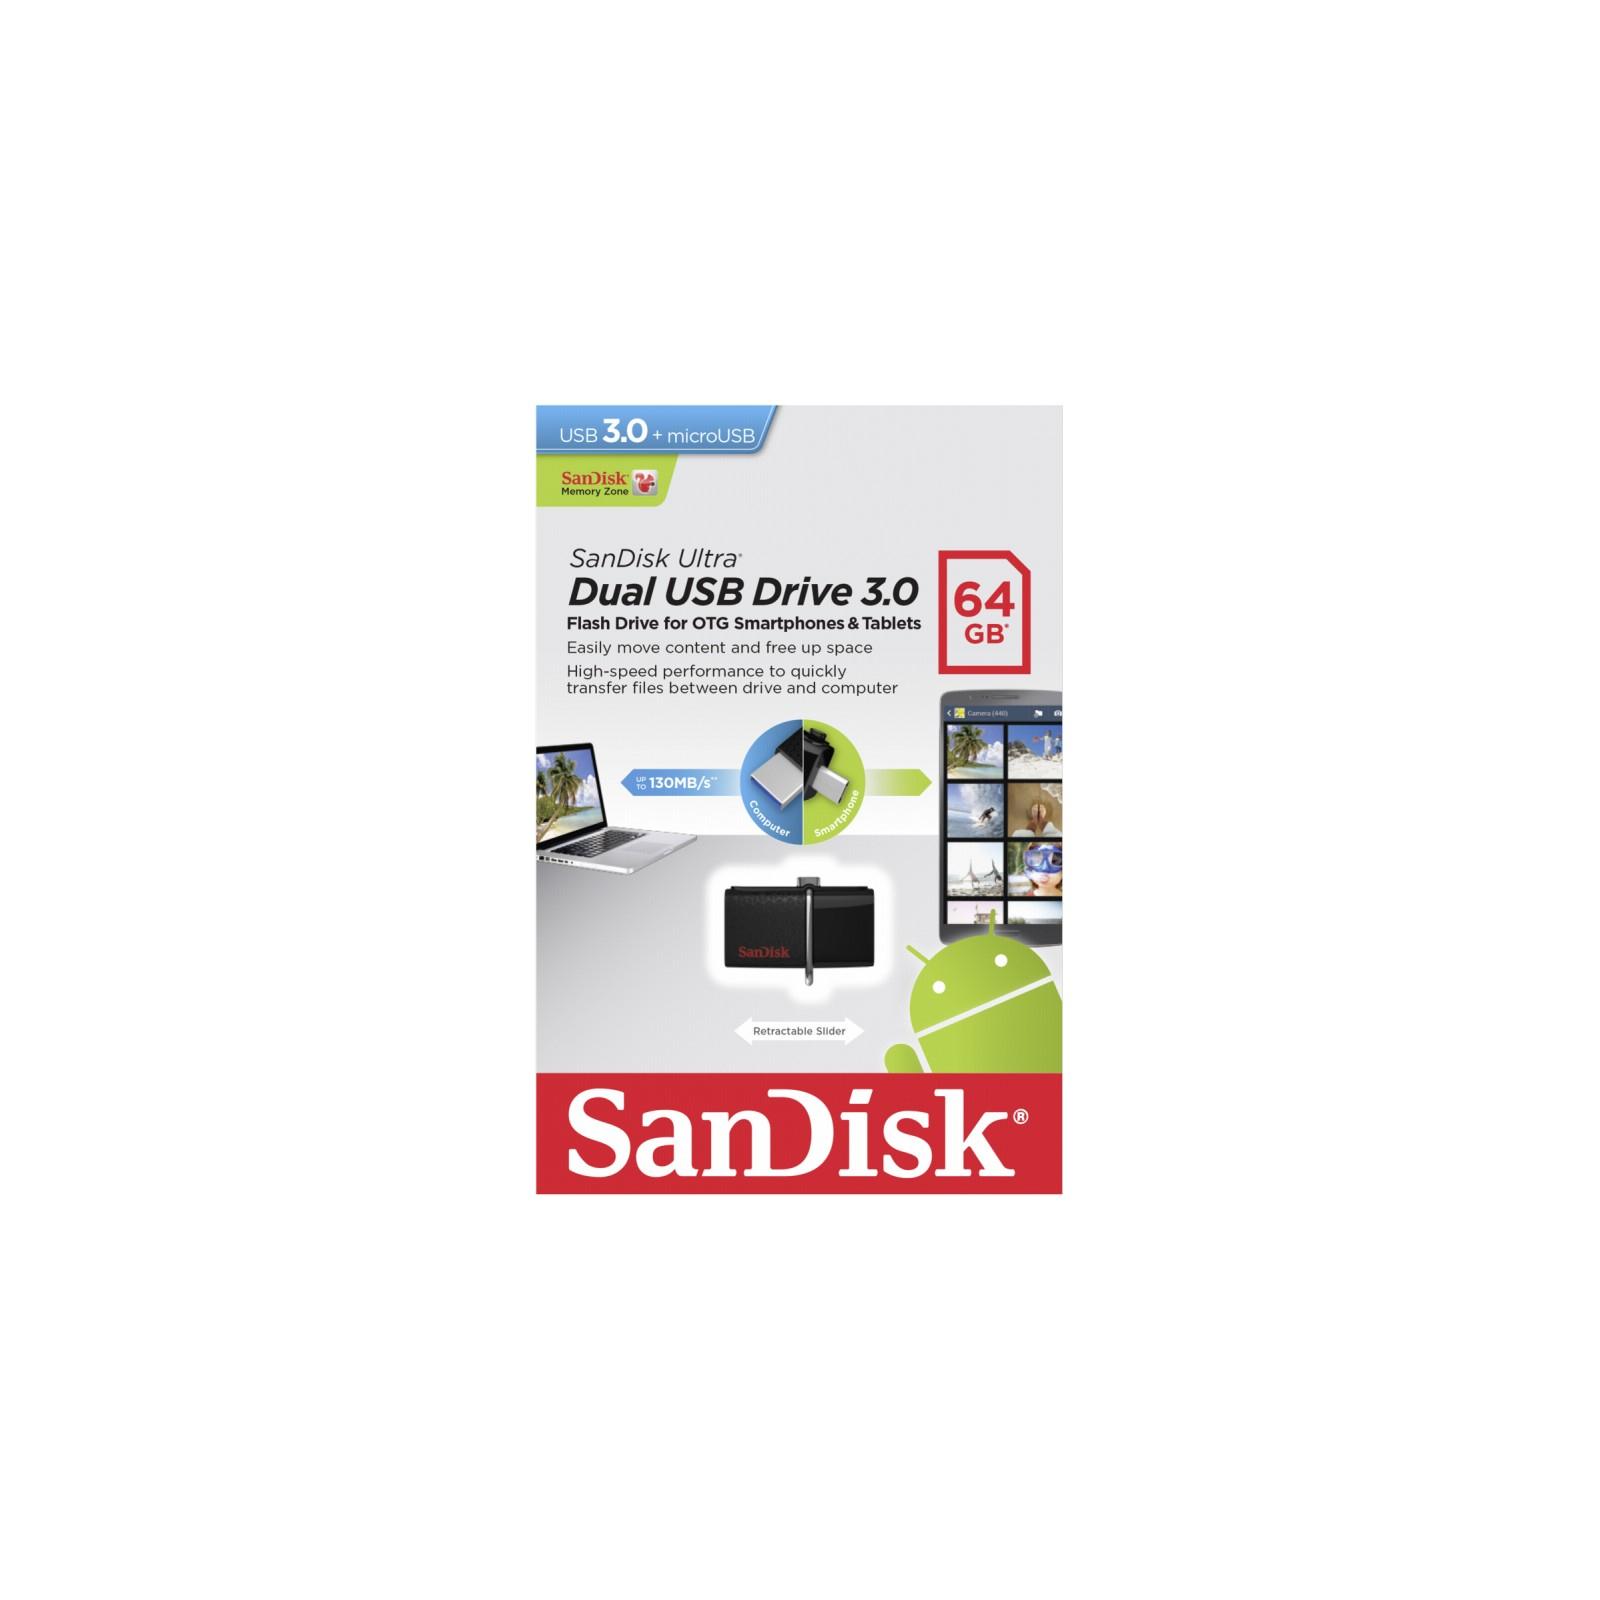 USB флеш накопитель SanDisk 64GB Ultra Dual Drive m3.0 White-Gold USB 3.0/OTG (SDDD3-064G-G46GW) изображение 7